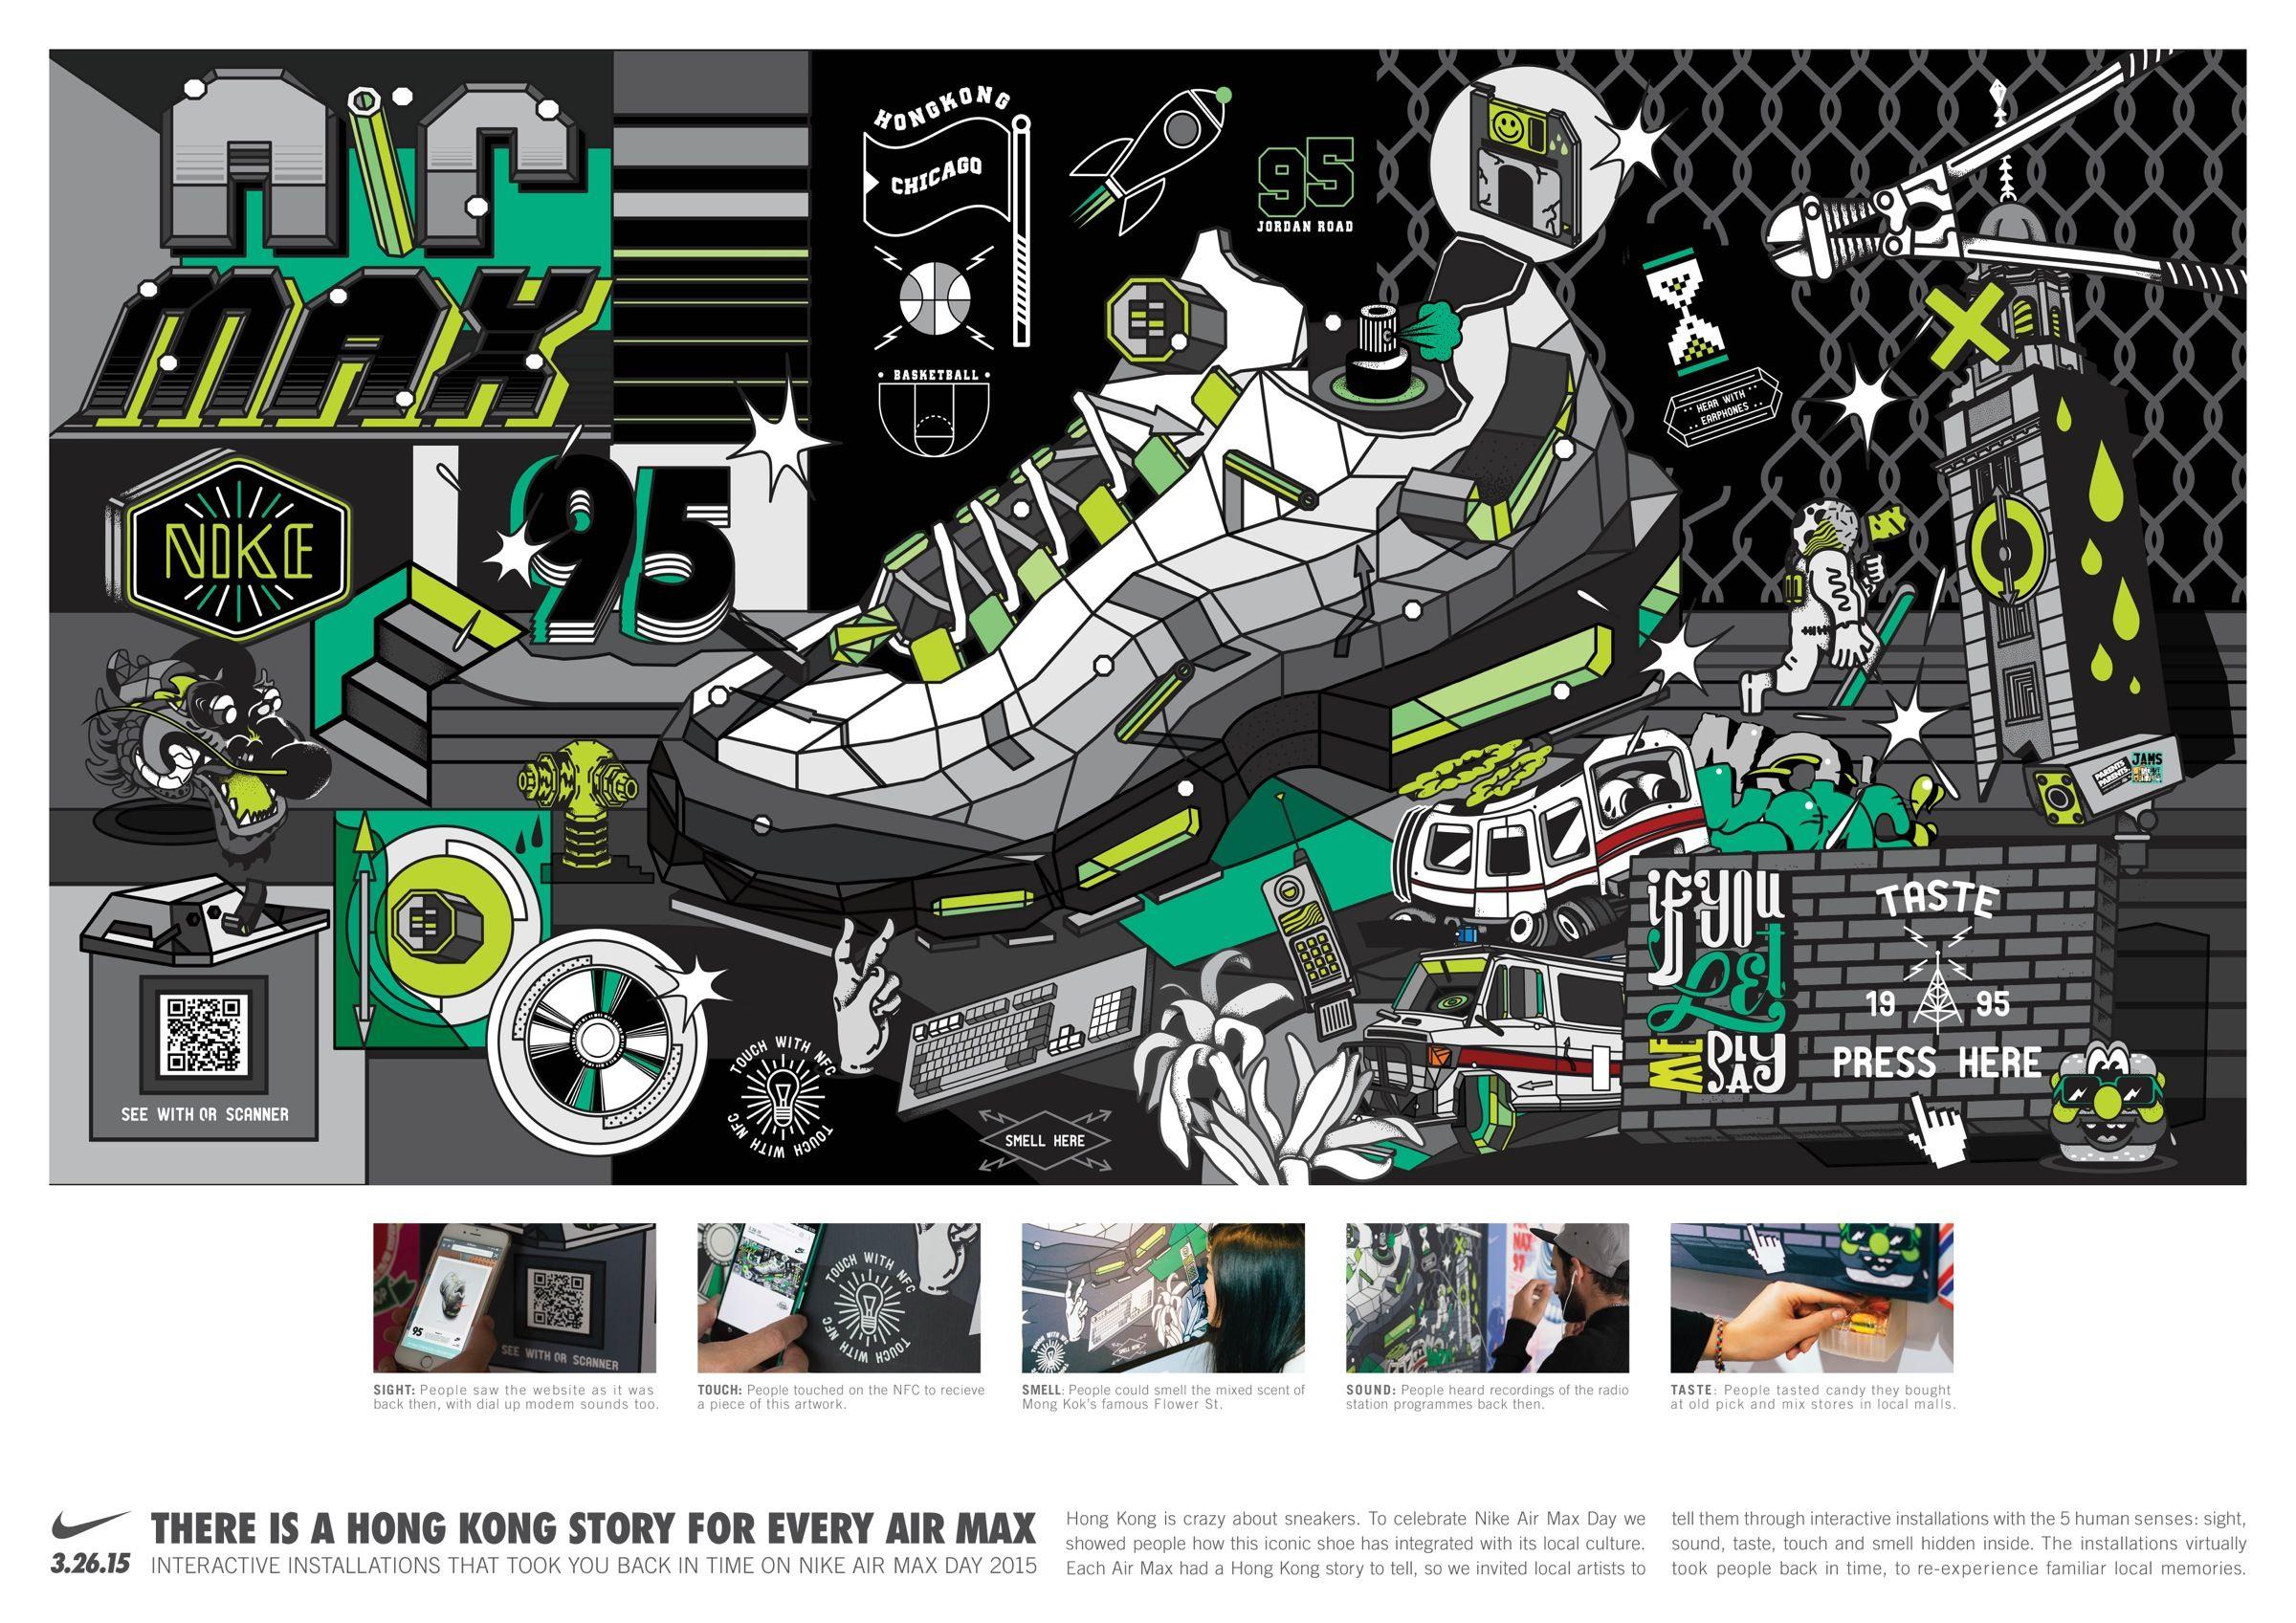 Adeevee Nike 2005 1997 1995 1990 1987 Air Max Day Air Max Air Max St